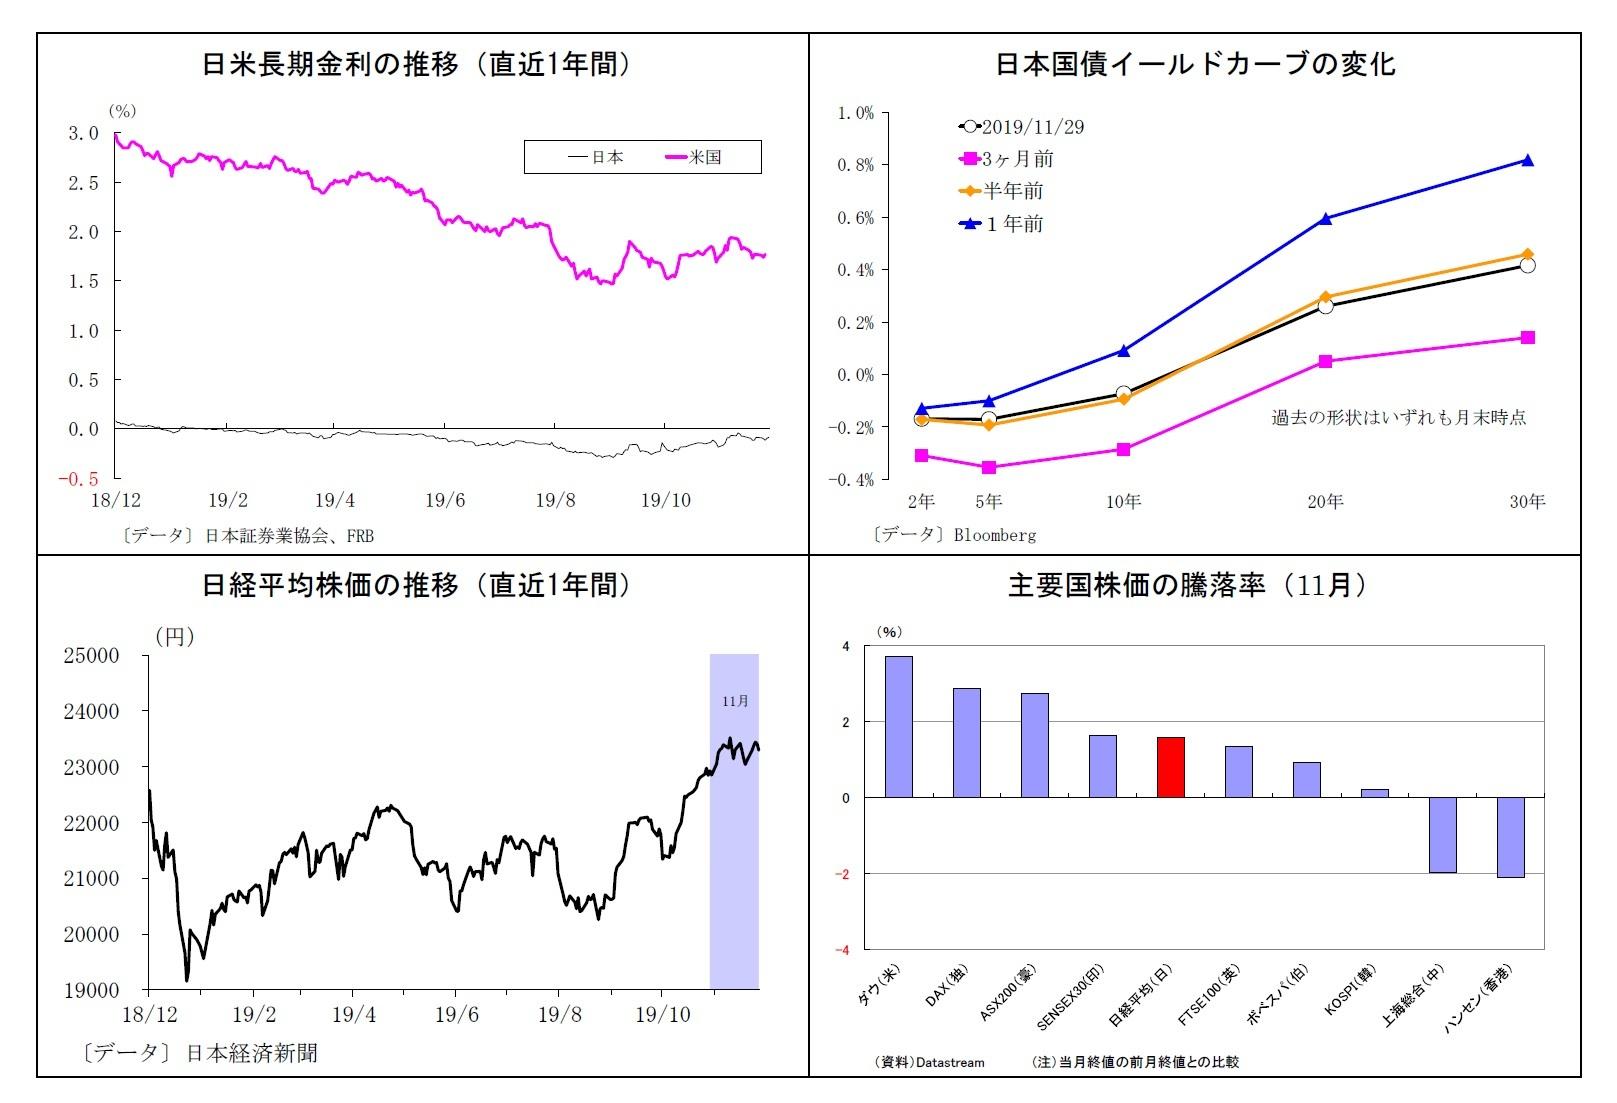 日米長期金利の推移(直近1年間)/日本国債イールドカーブの変化/日経平均株価の推移(直近1年間)/主要国株価の騰落率(11月)